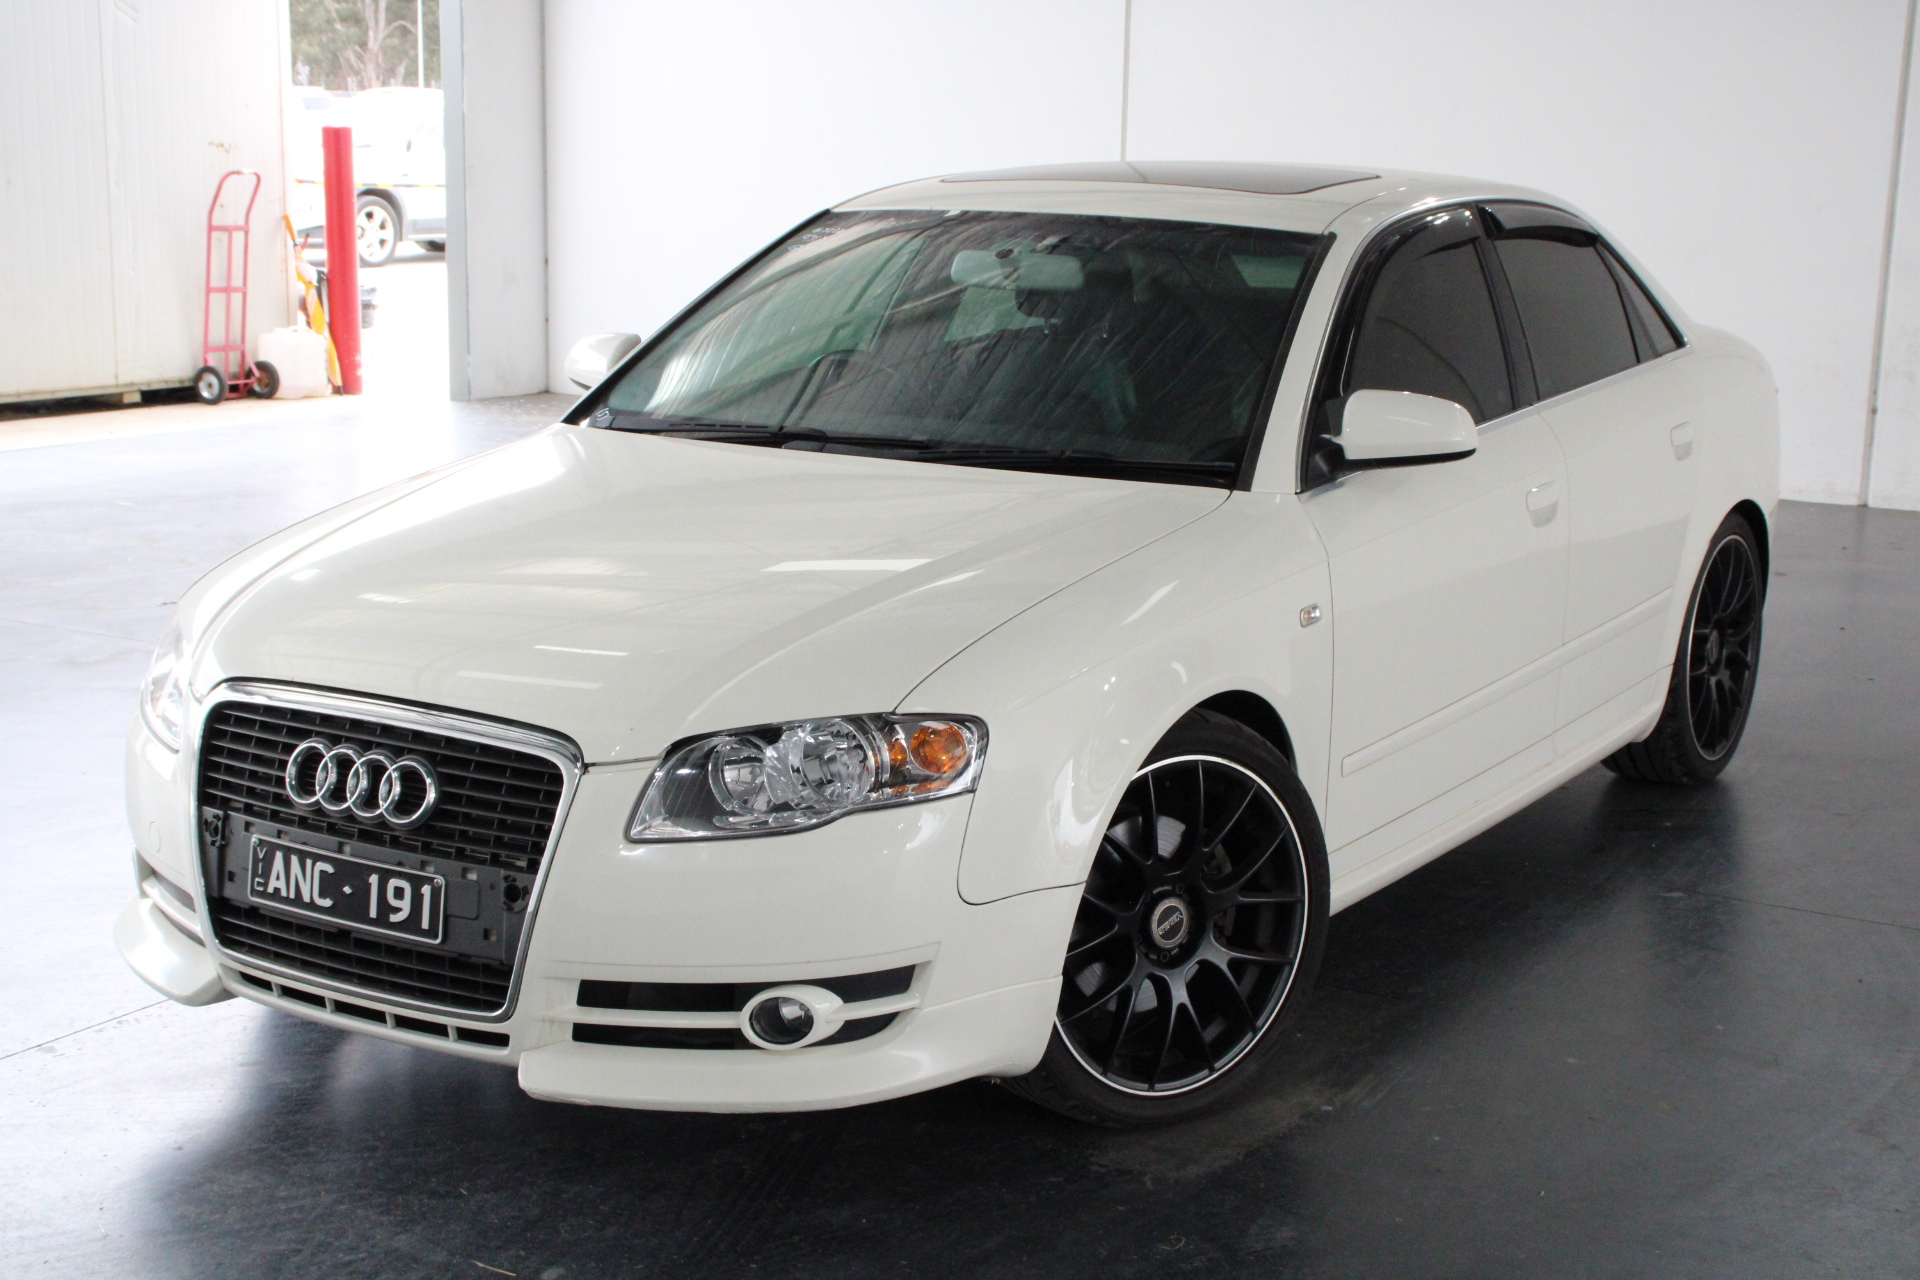 2006 Audi A4 1.8T B7 CVT Sedan